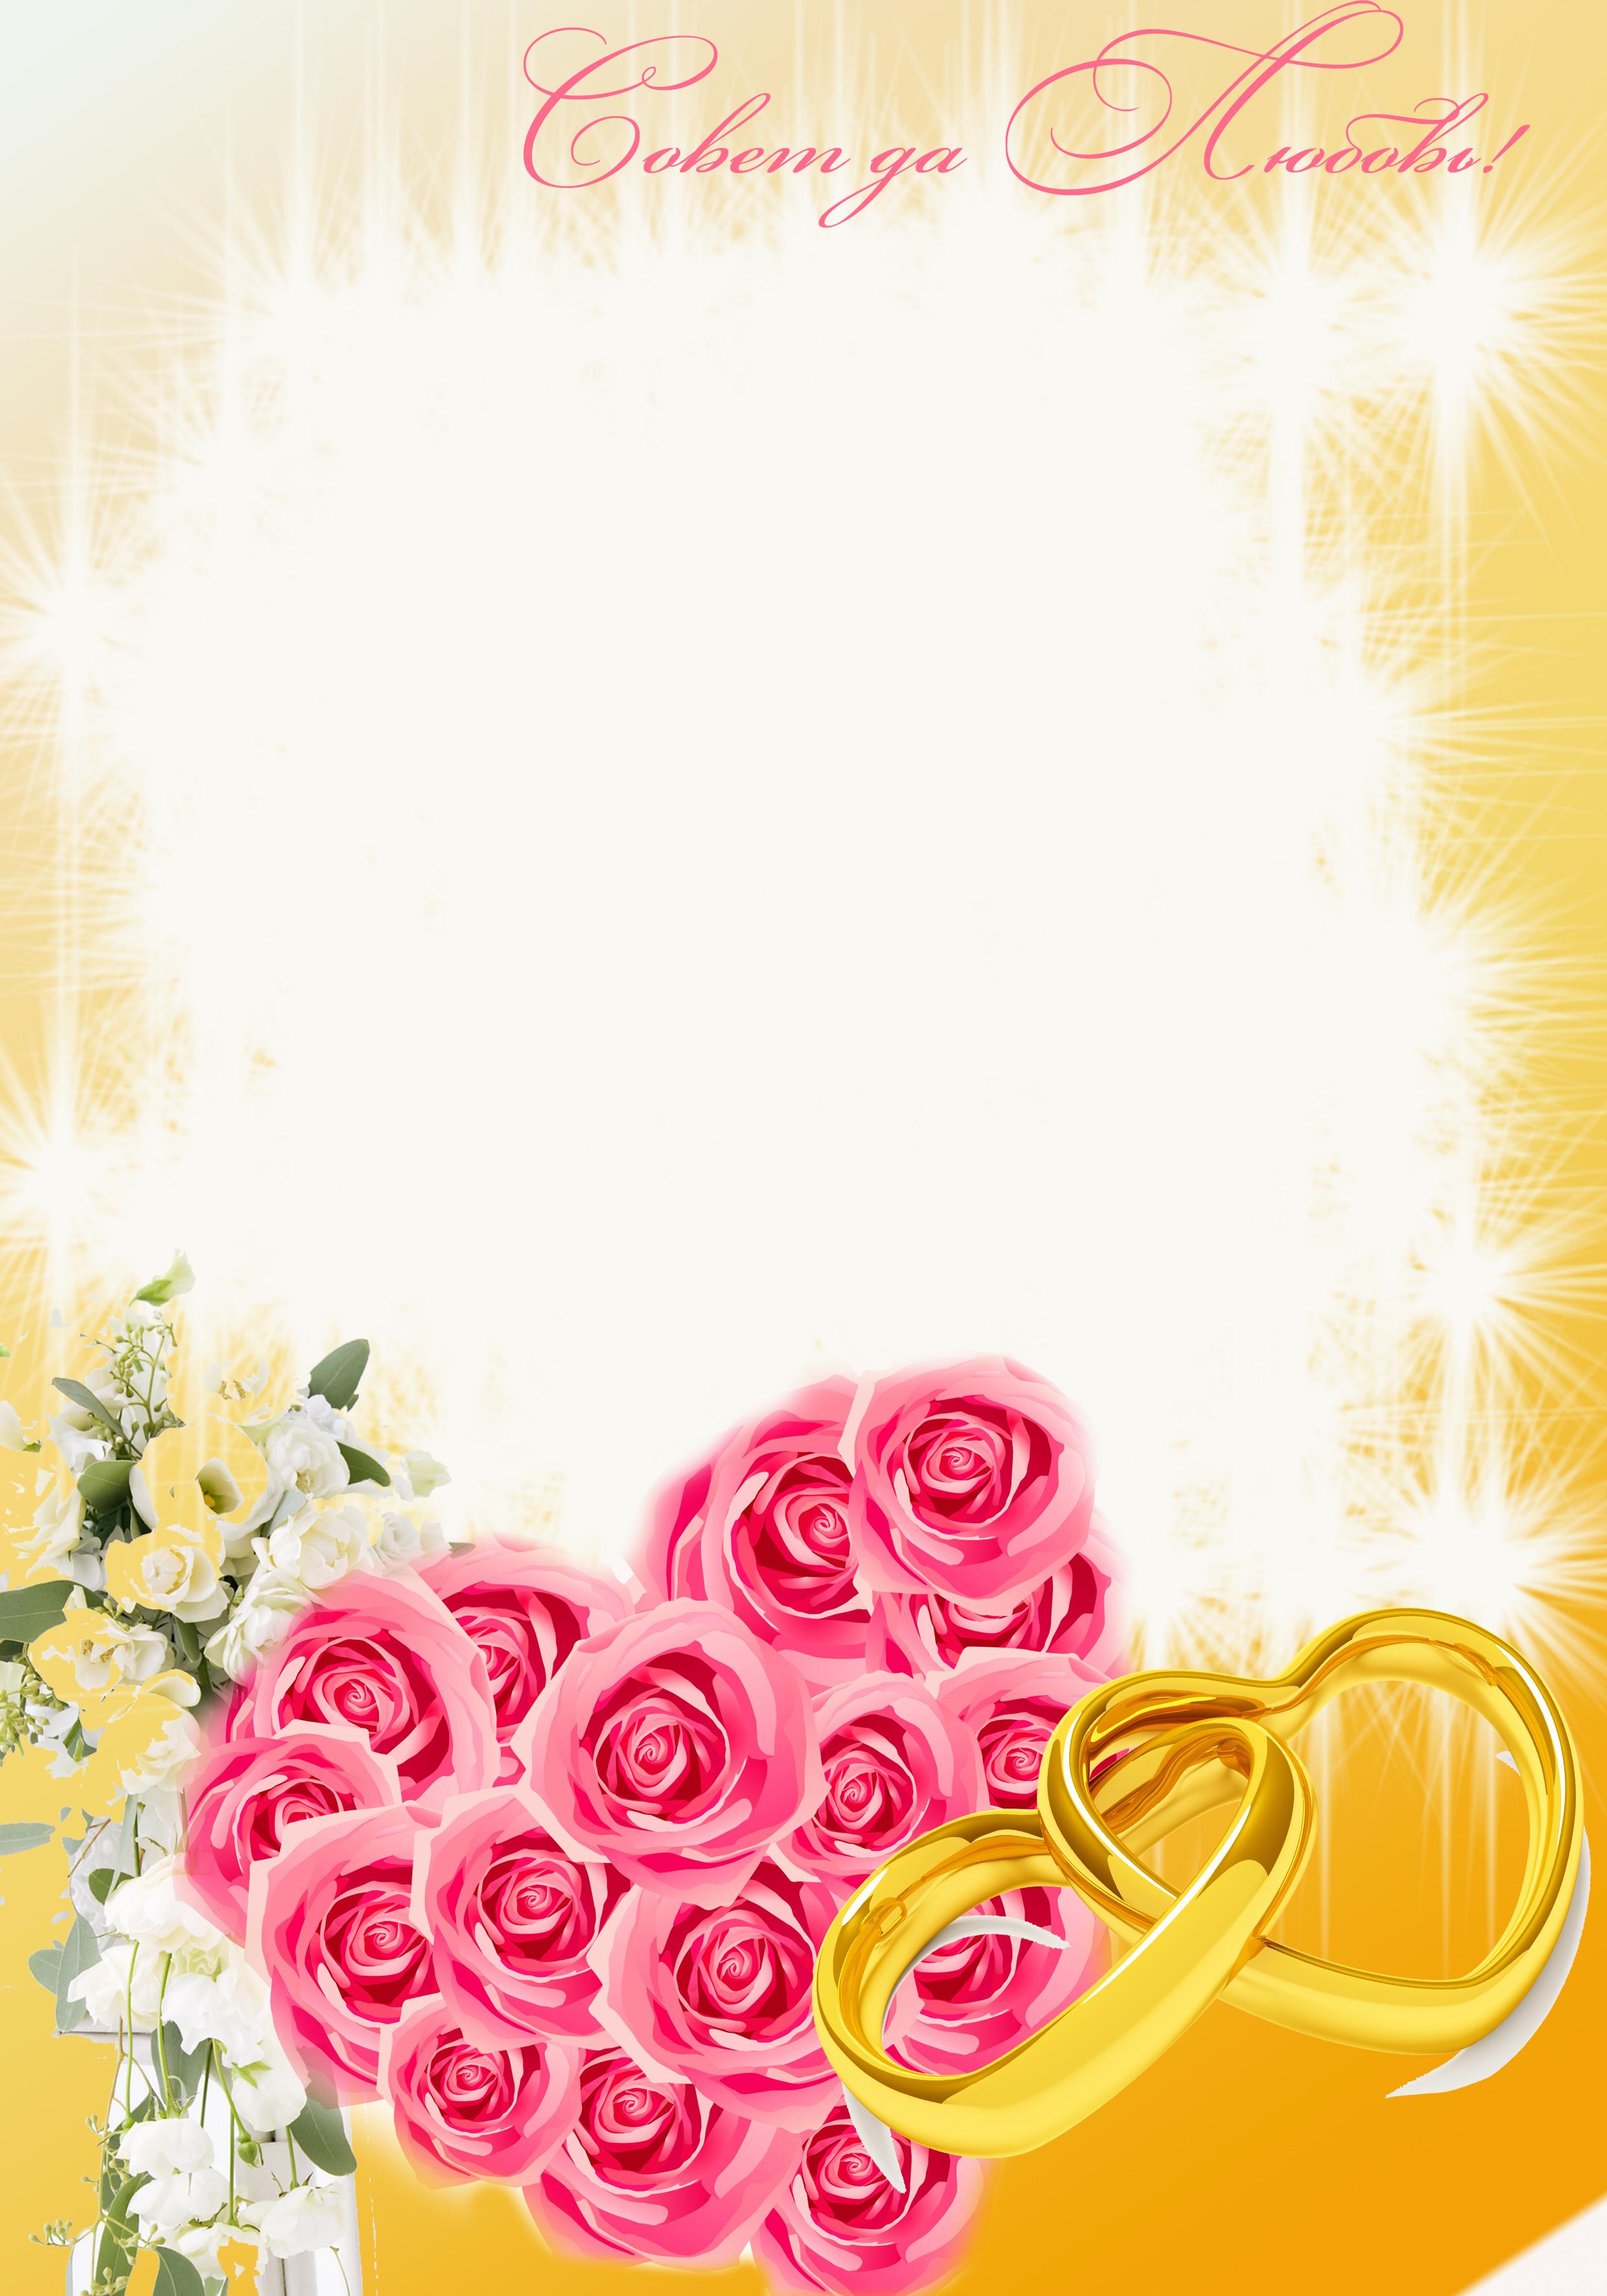 Шаблоны на открытки с днем свадьбы